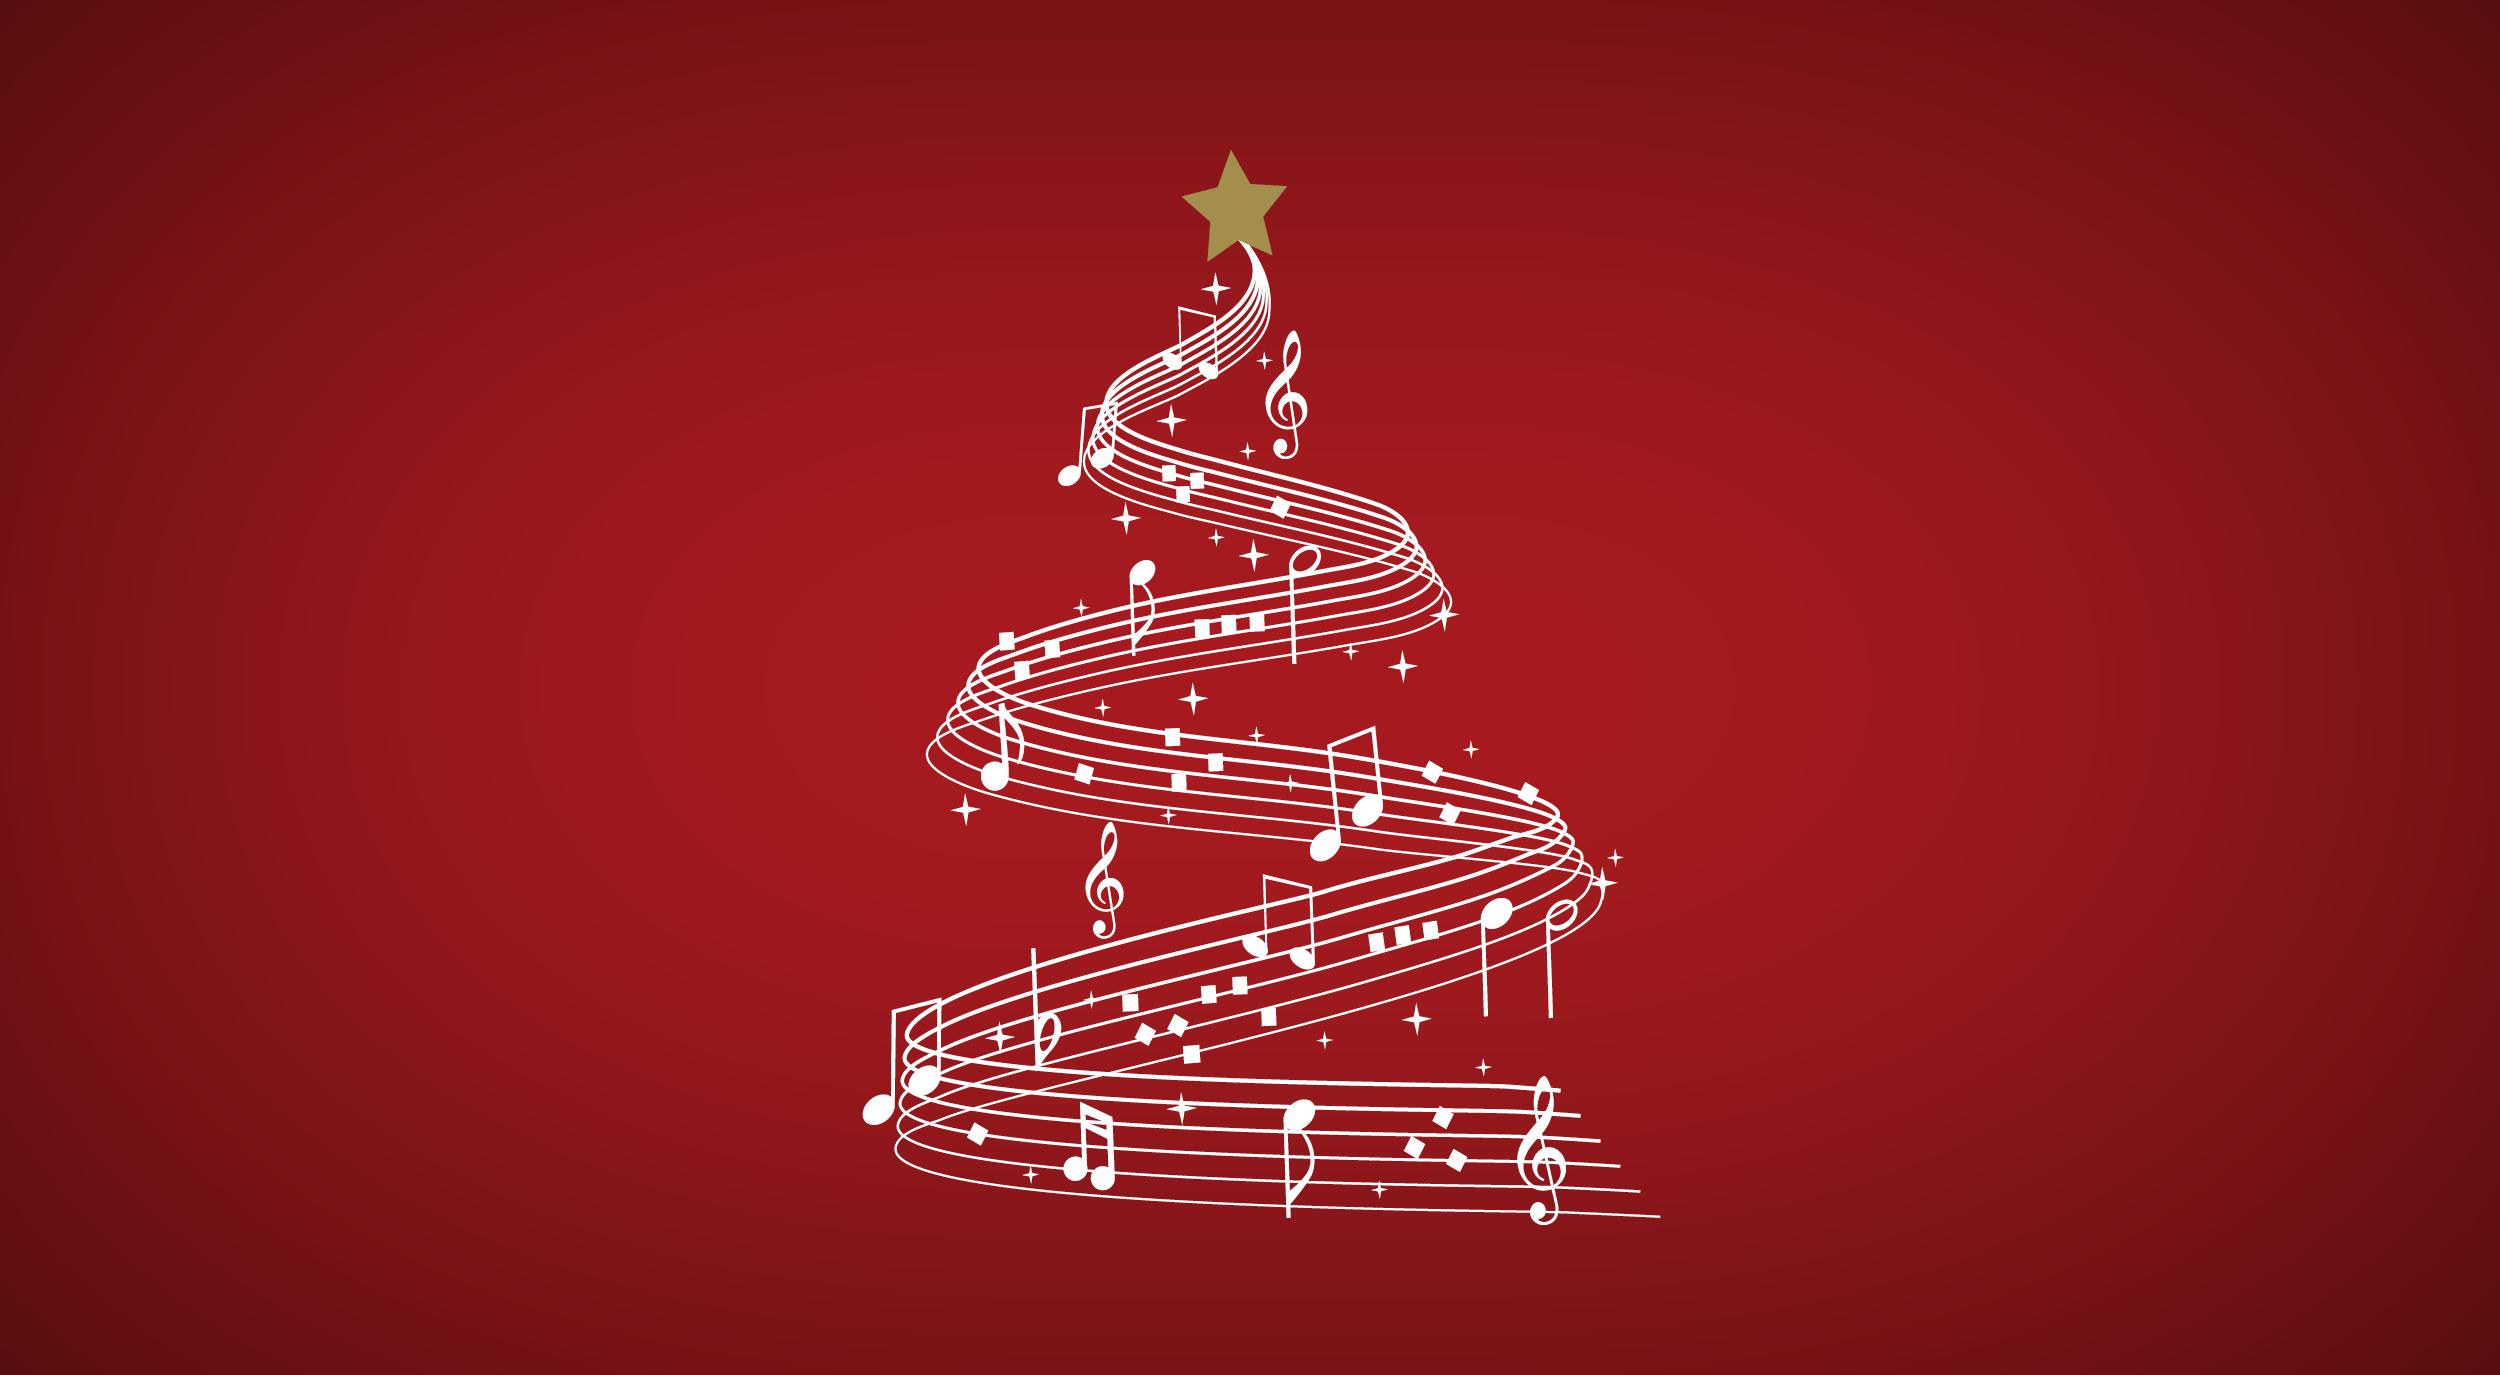 Hallmark channel christmas sweepstakes